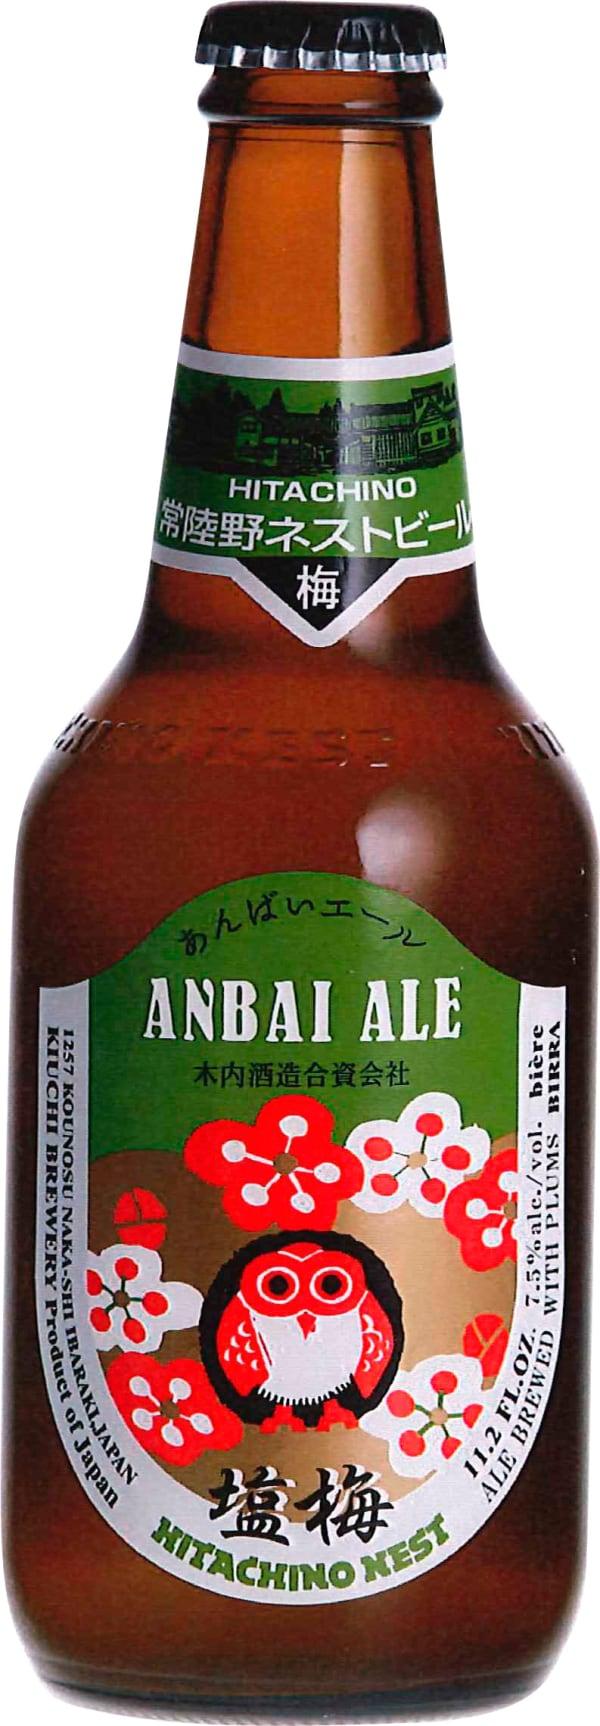 Hitachino Nest Anbai Ale